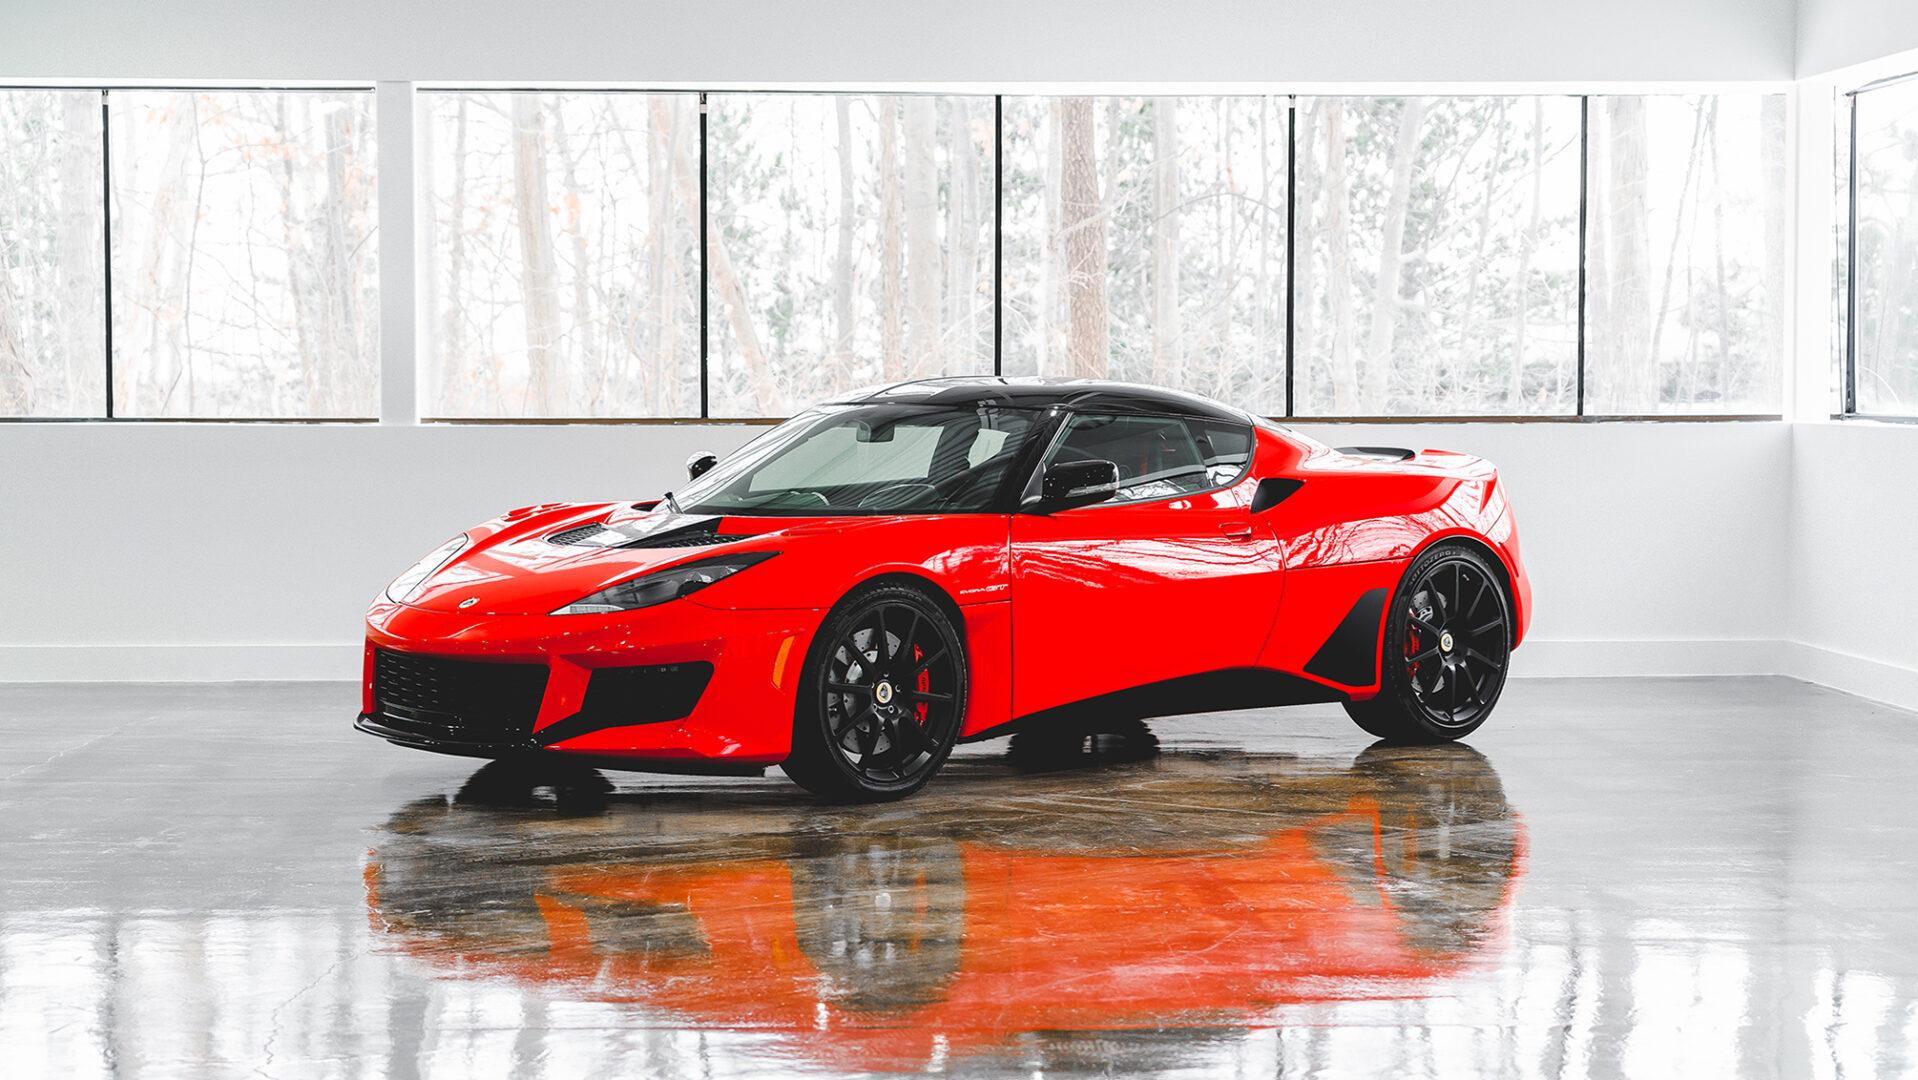 B 4 2020 Lotus Evora (lotus)1